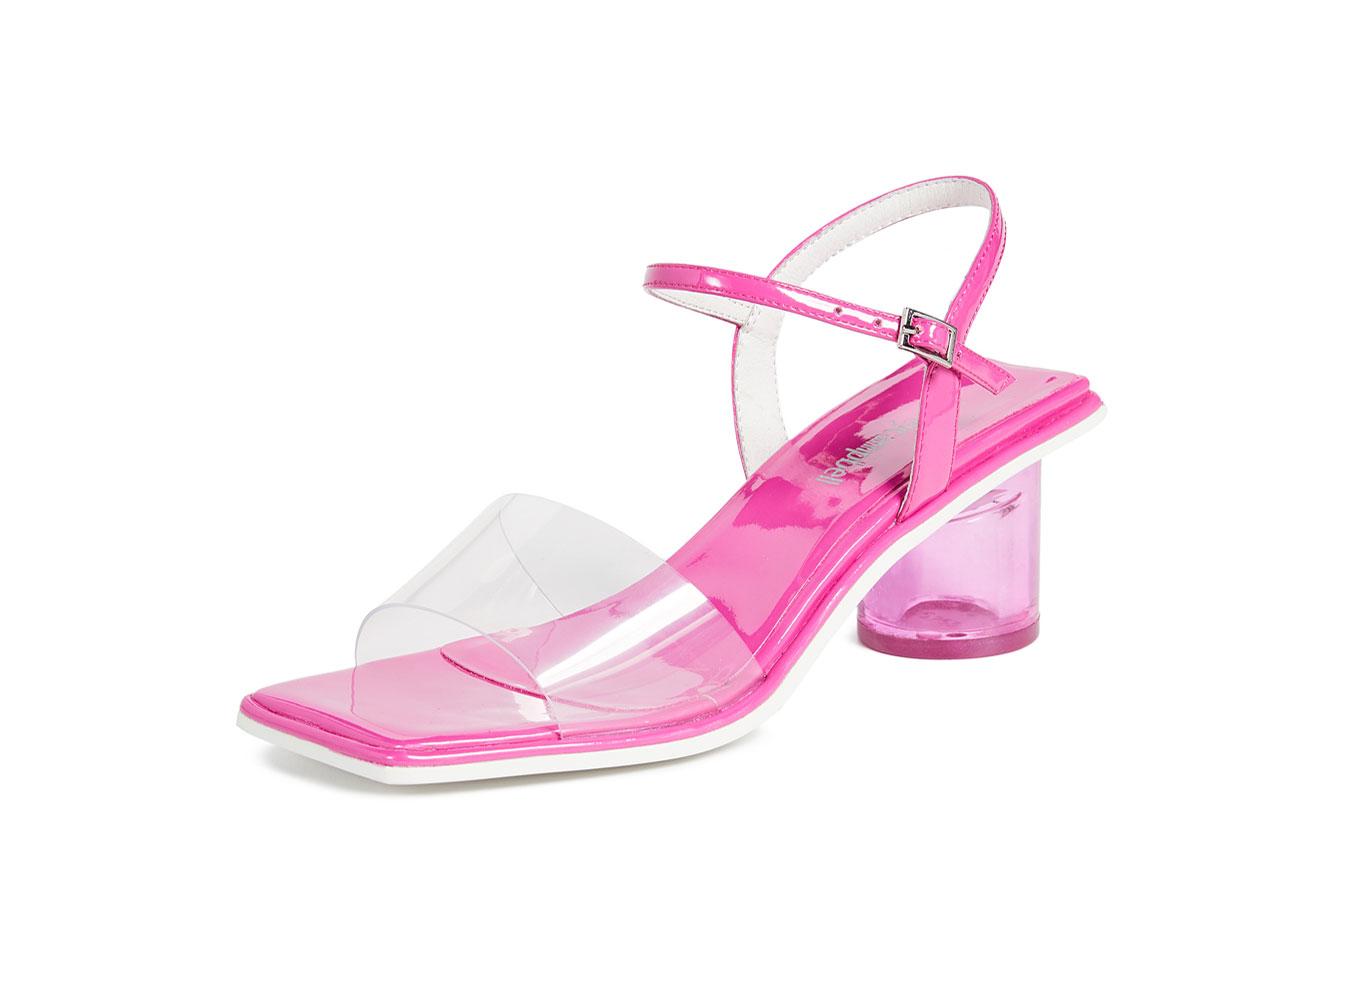 Jeffrey Campbell Futuro Ankle Strap Sandals